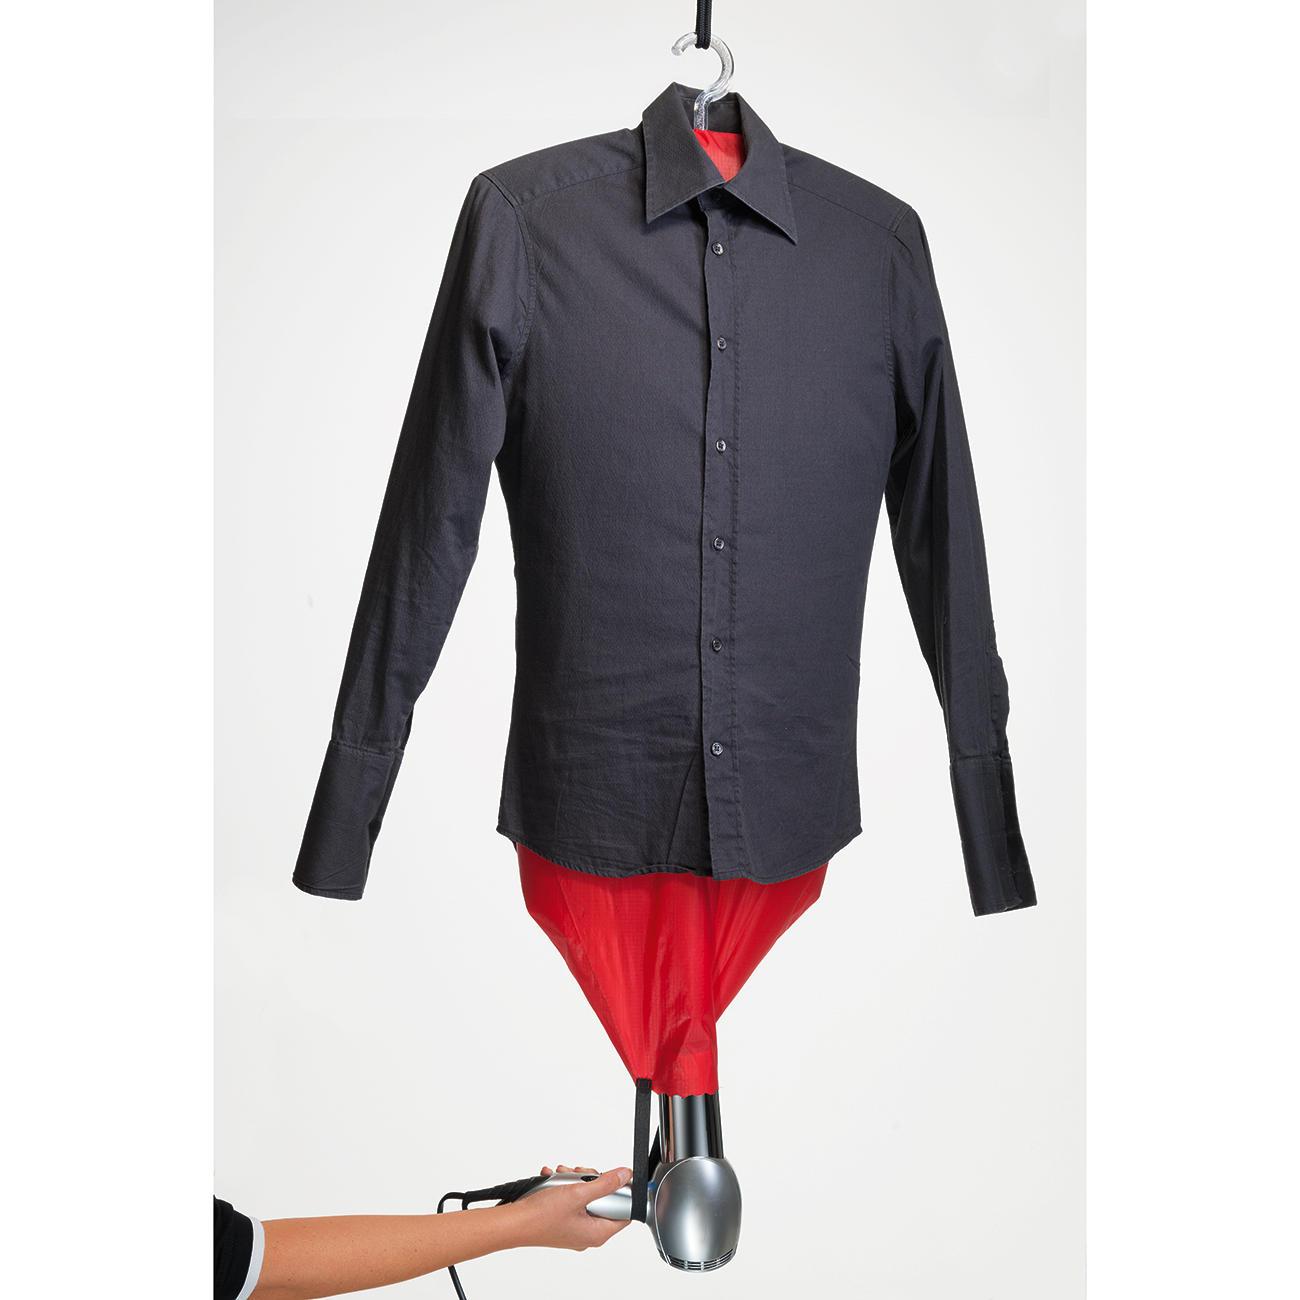 Acheter assistant repassage mashati en ligne pas cher - Repasser une chemise sans fer ...